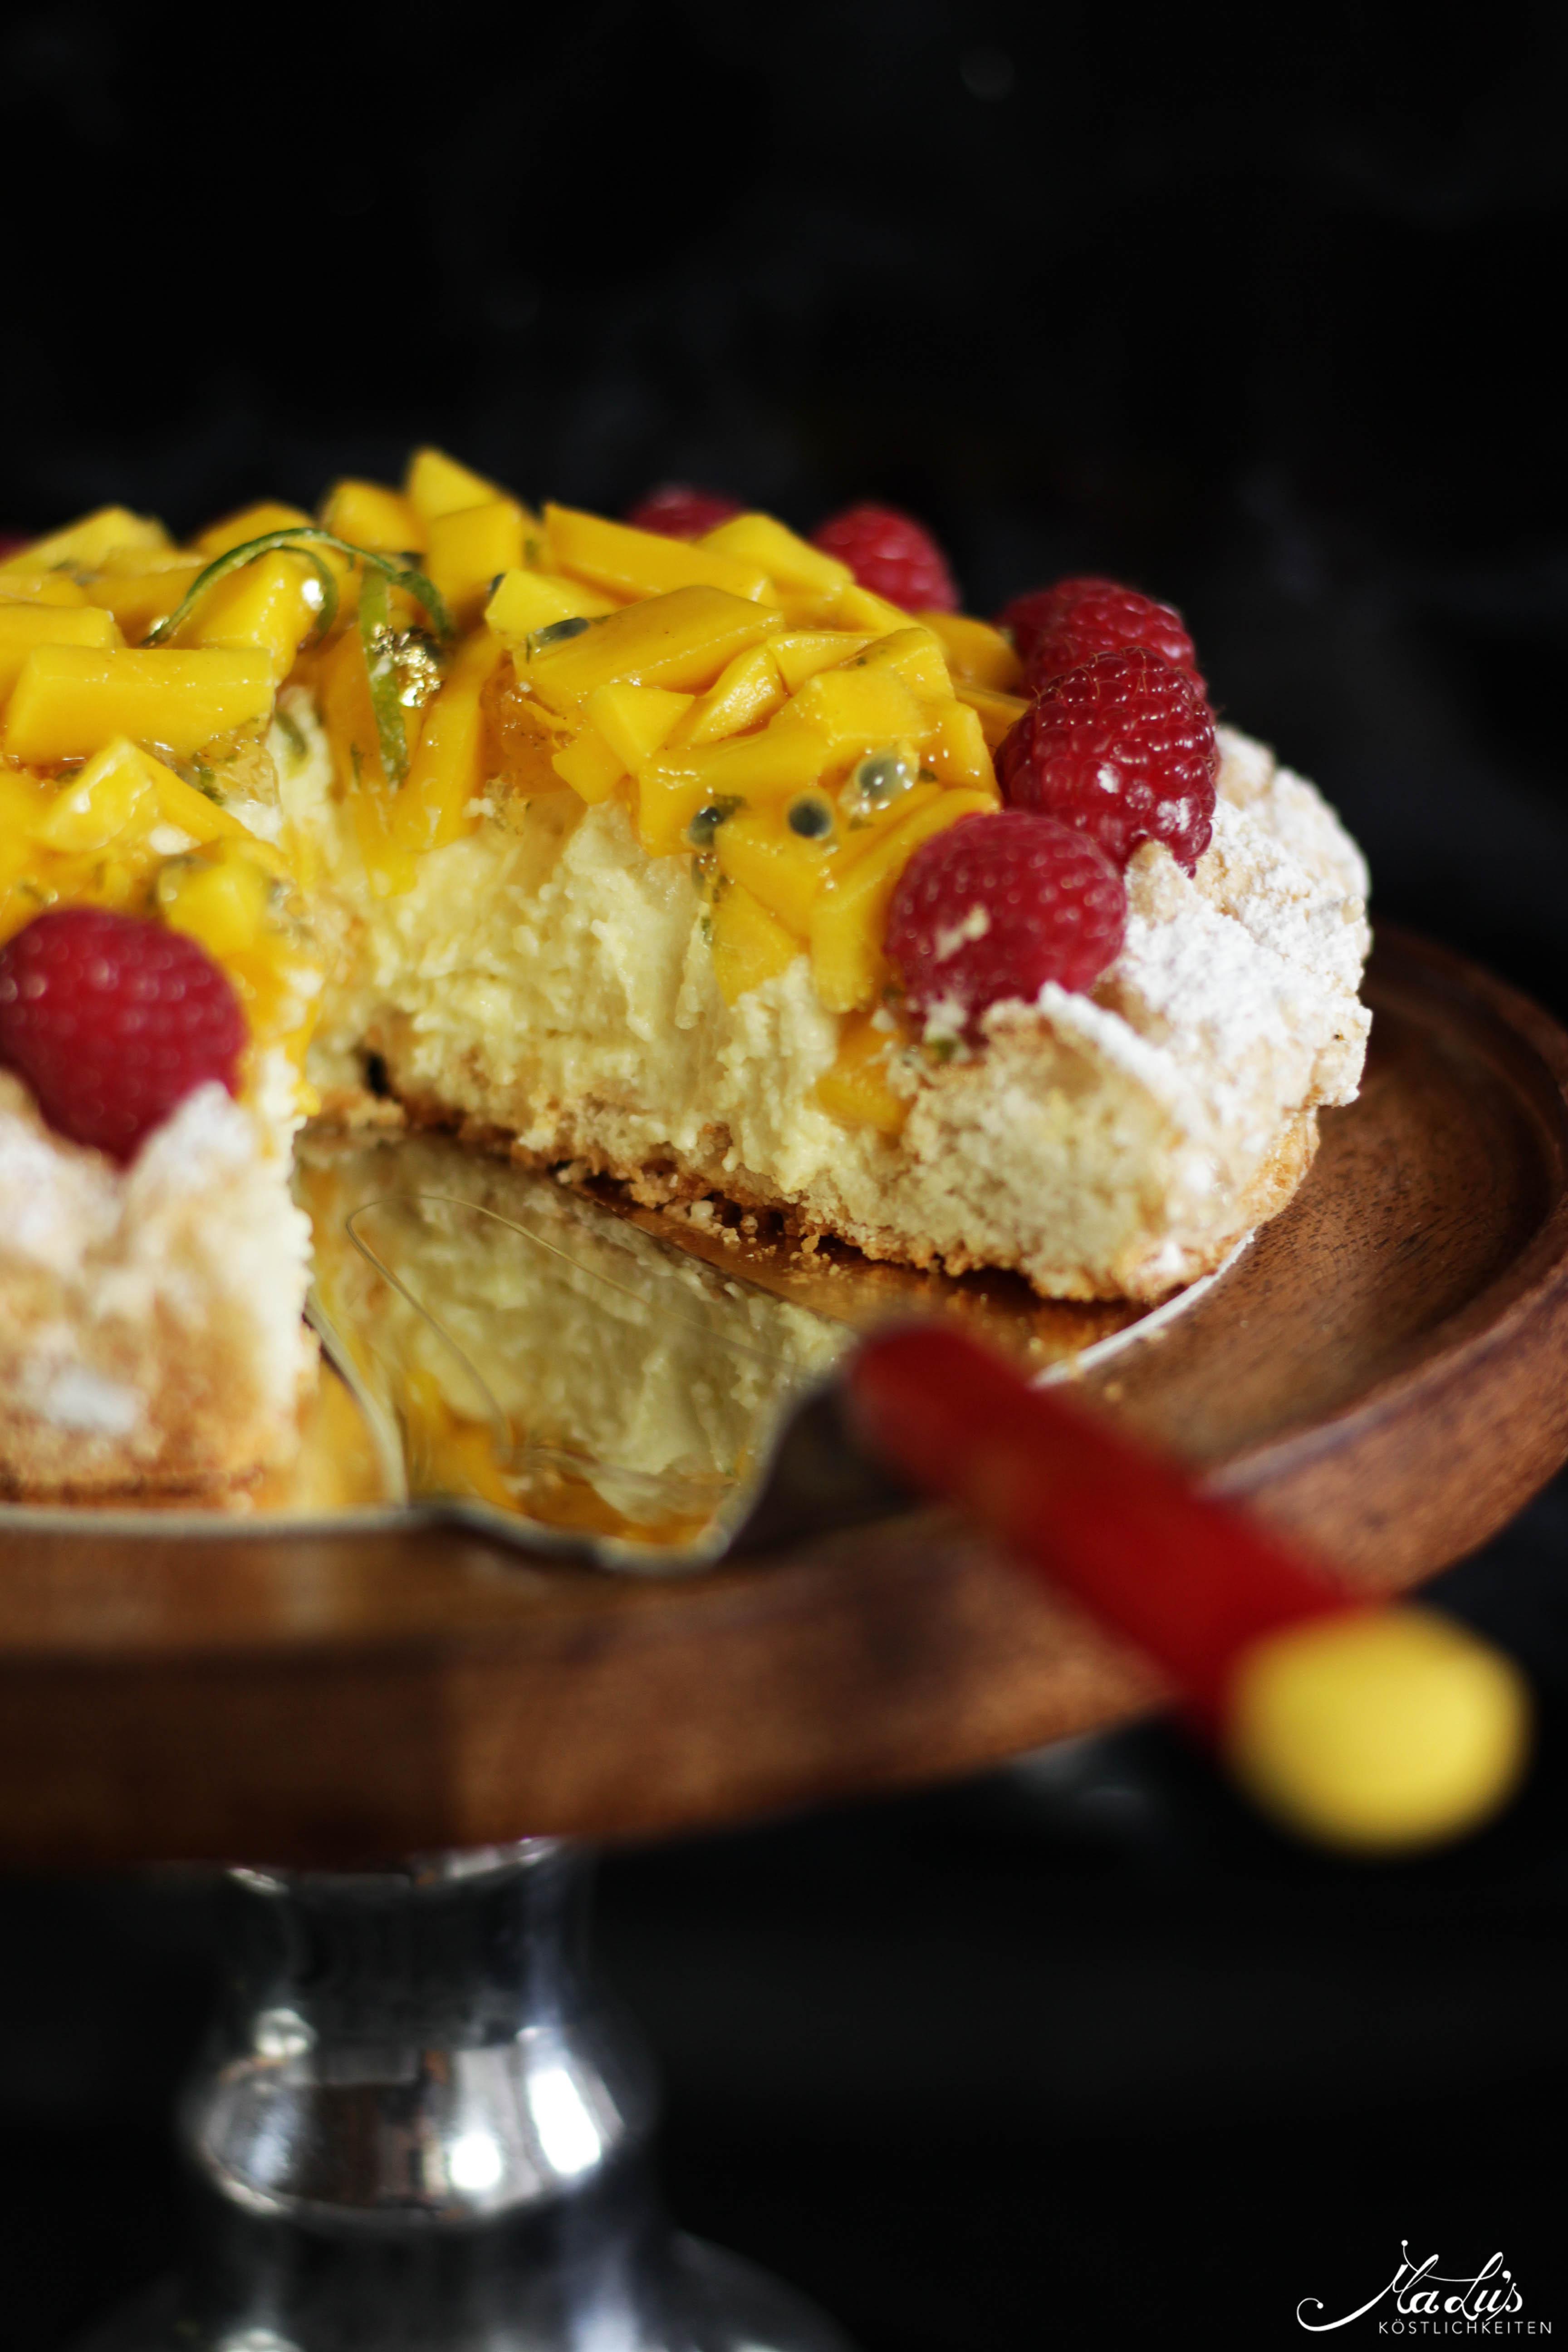 Mango-Kokosmakronen Torte | Maren Lubbe 7